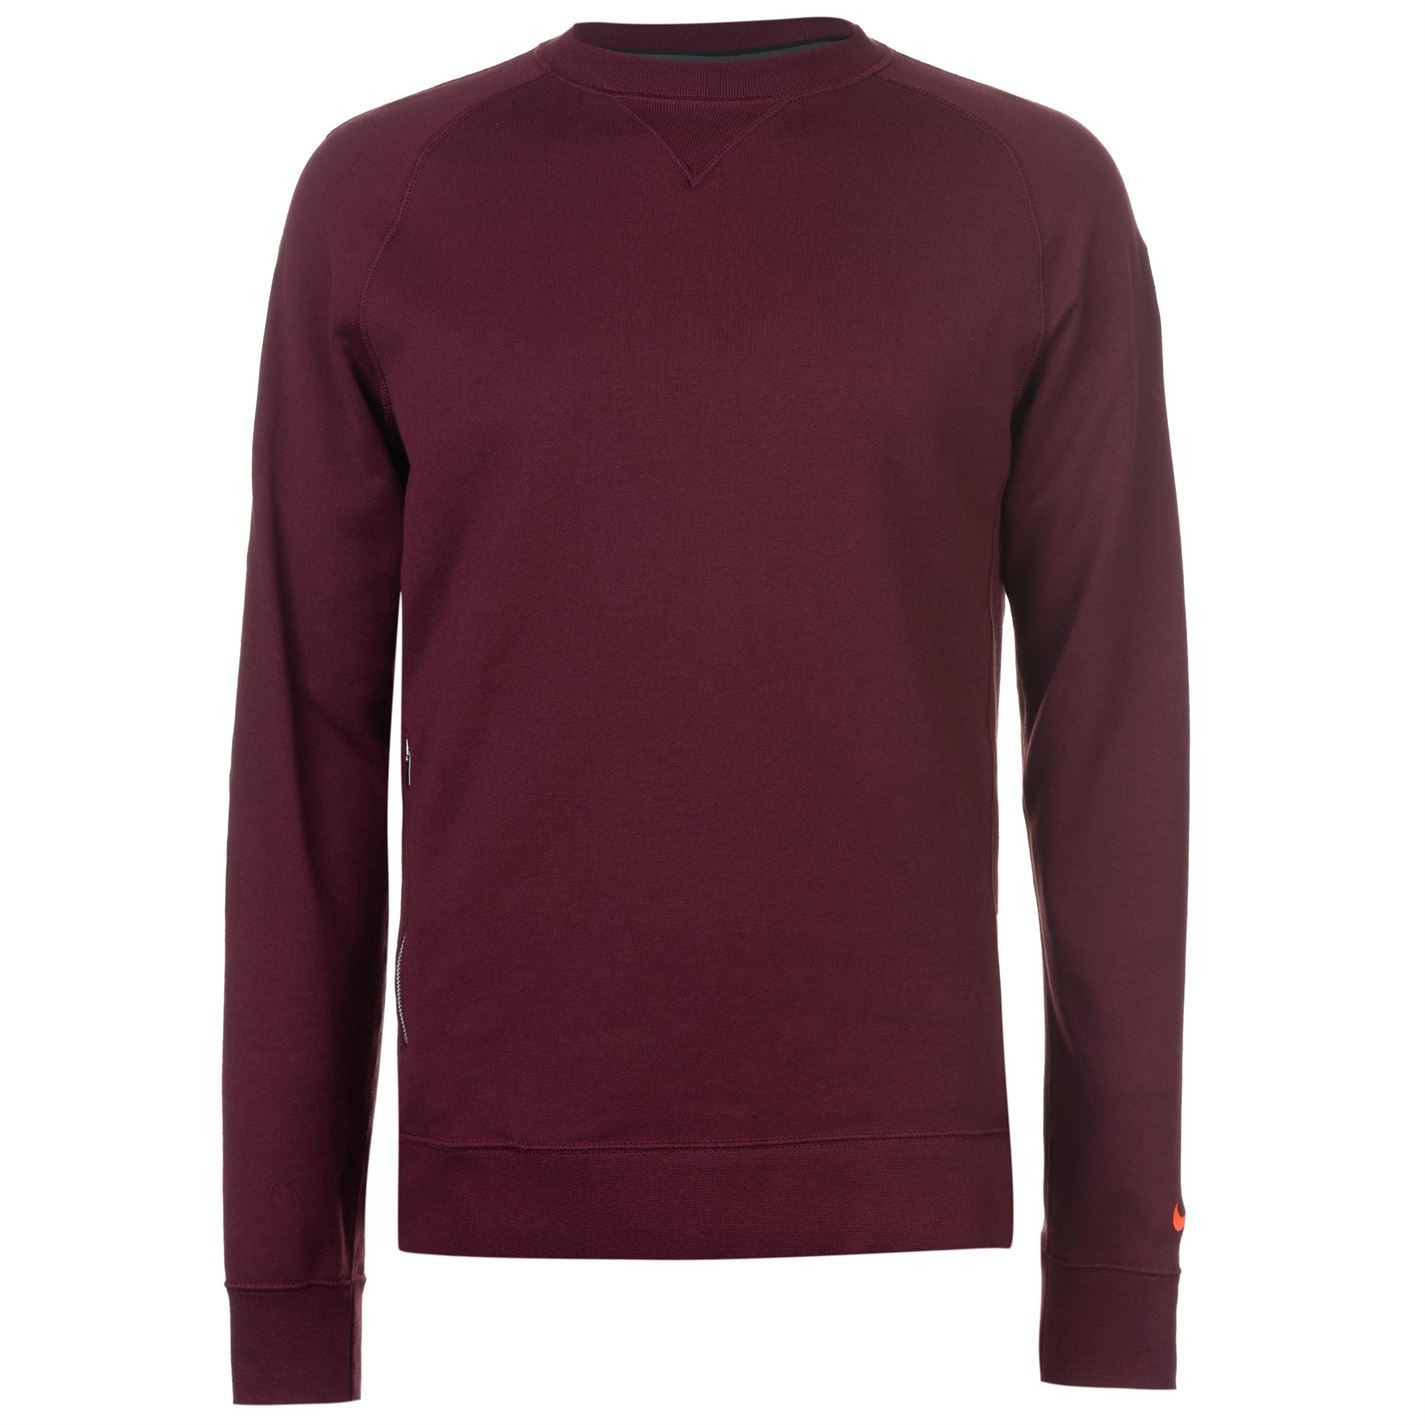 ef5f77bb420 Nike FC Barcelona Crew Sweater Mens Purple Football Soccer Sweatshirt  Jumper Top